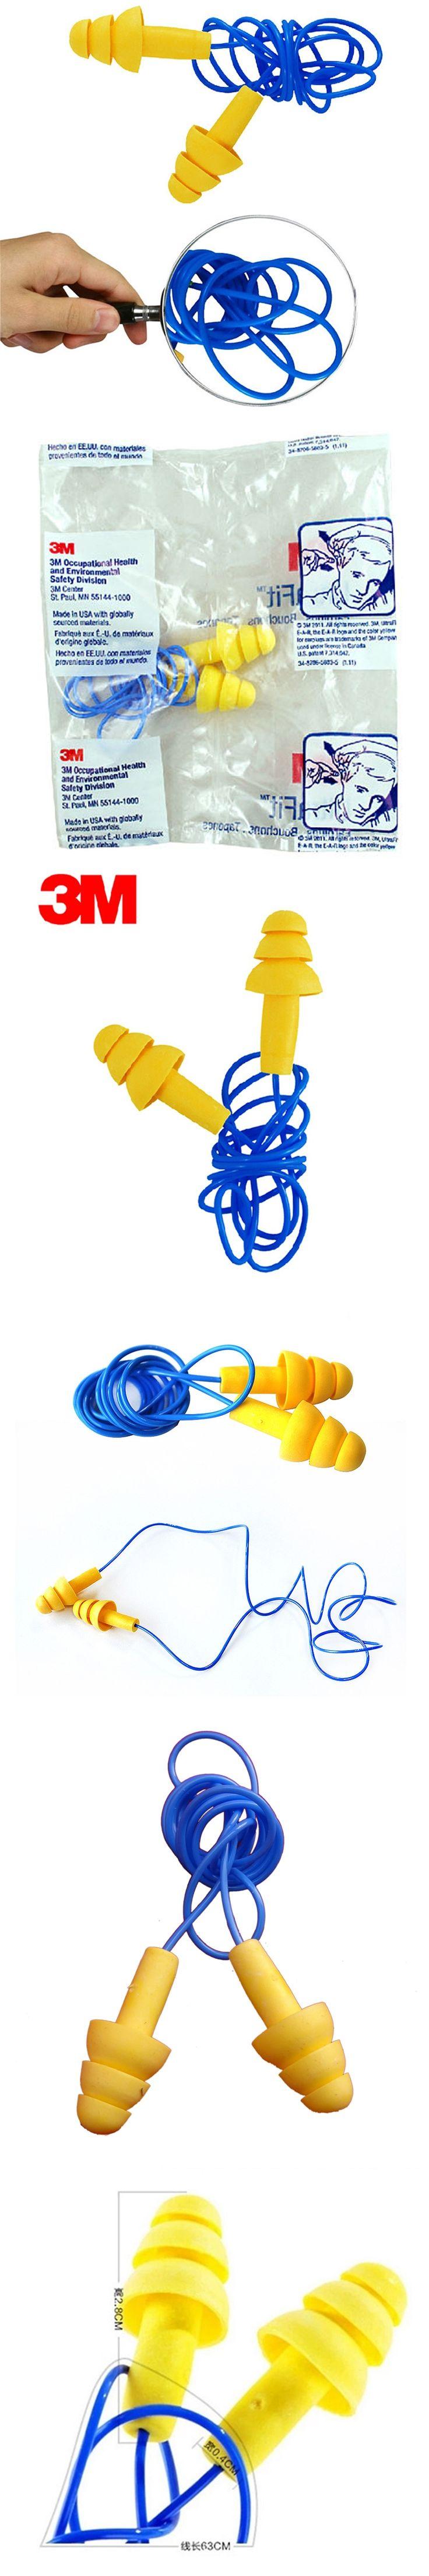 5pcs 3M340-4004 Authentic Foam Soft  Silicone EarPlugs Noise Reduction christmas tree Earplugs  Swimming Protective earmuffs